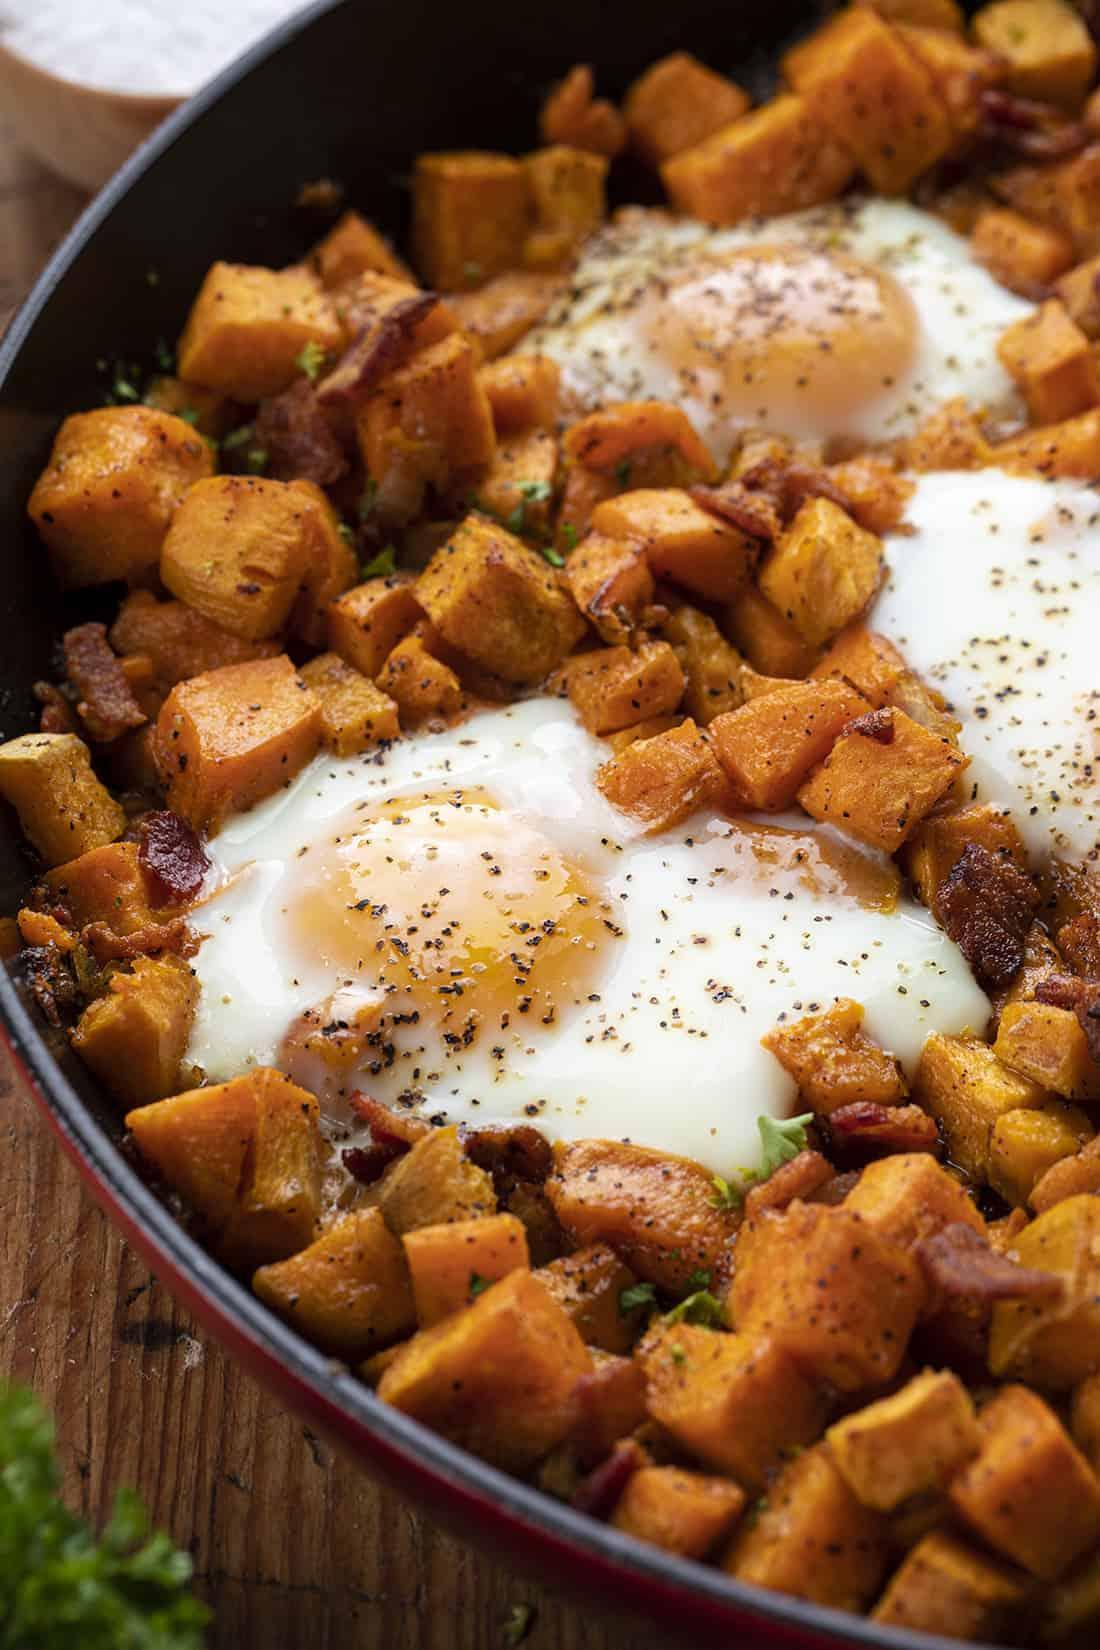 Pan of Sweet Potato Hash